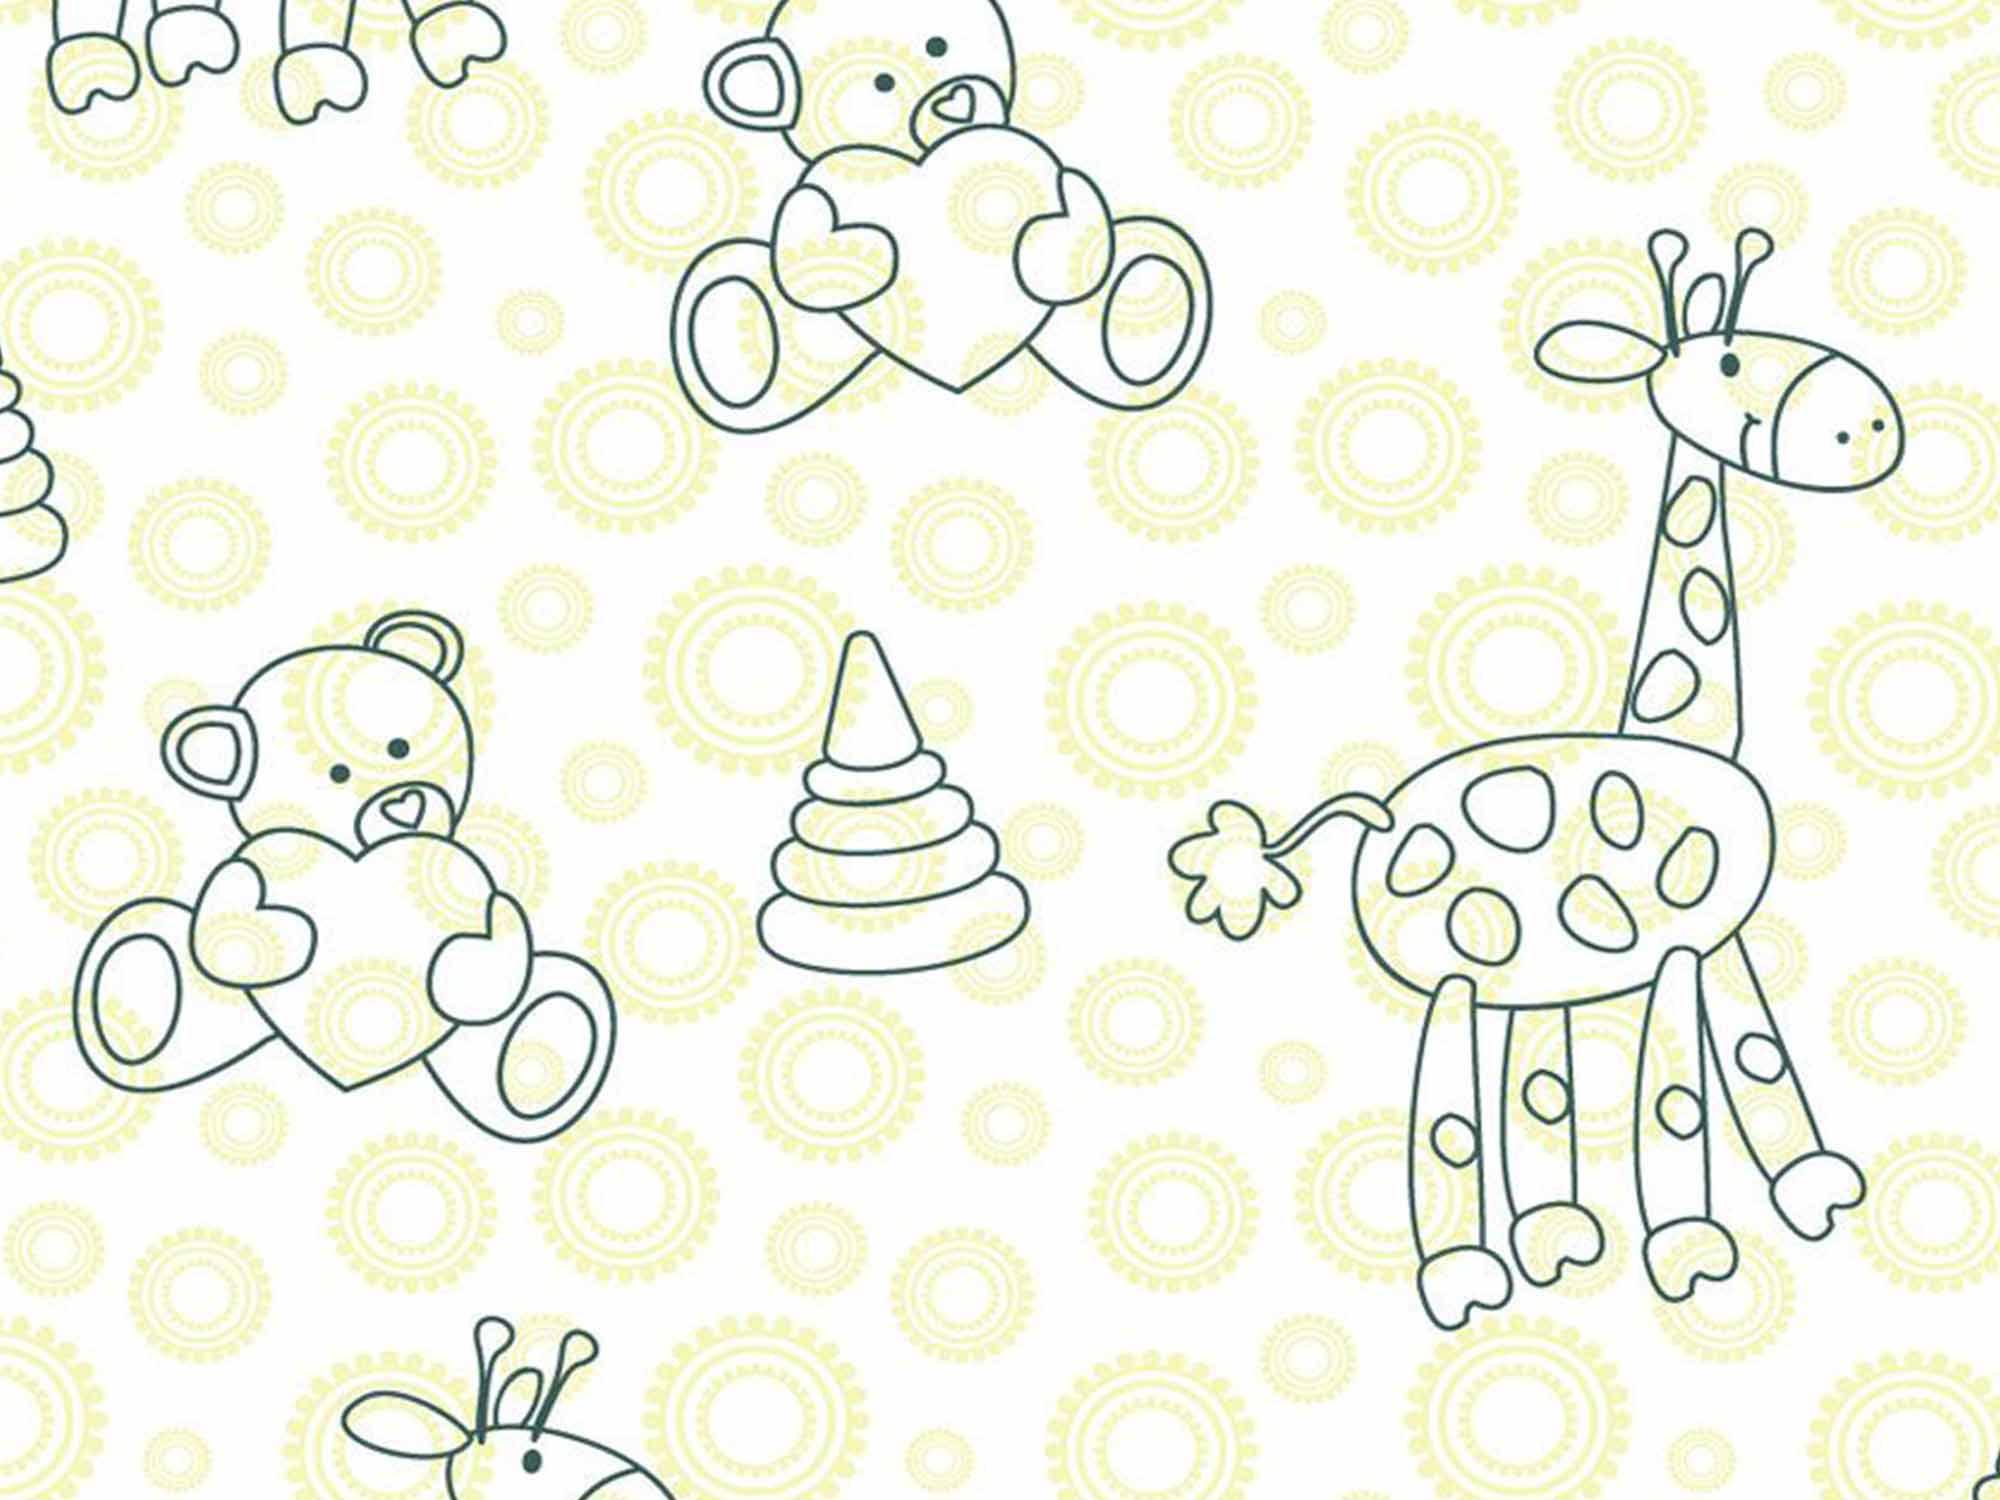 Papel de Parede Infantil 0021 - Adesivos de Parede  - Paredes Decoradas